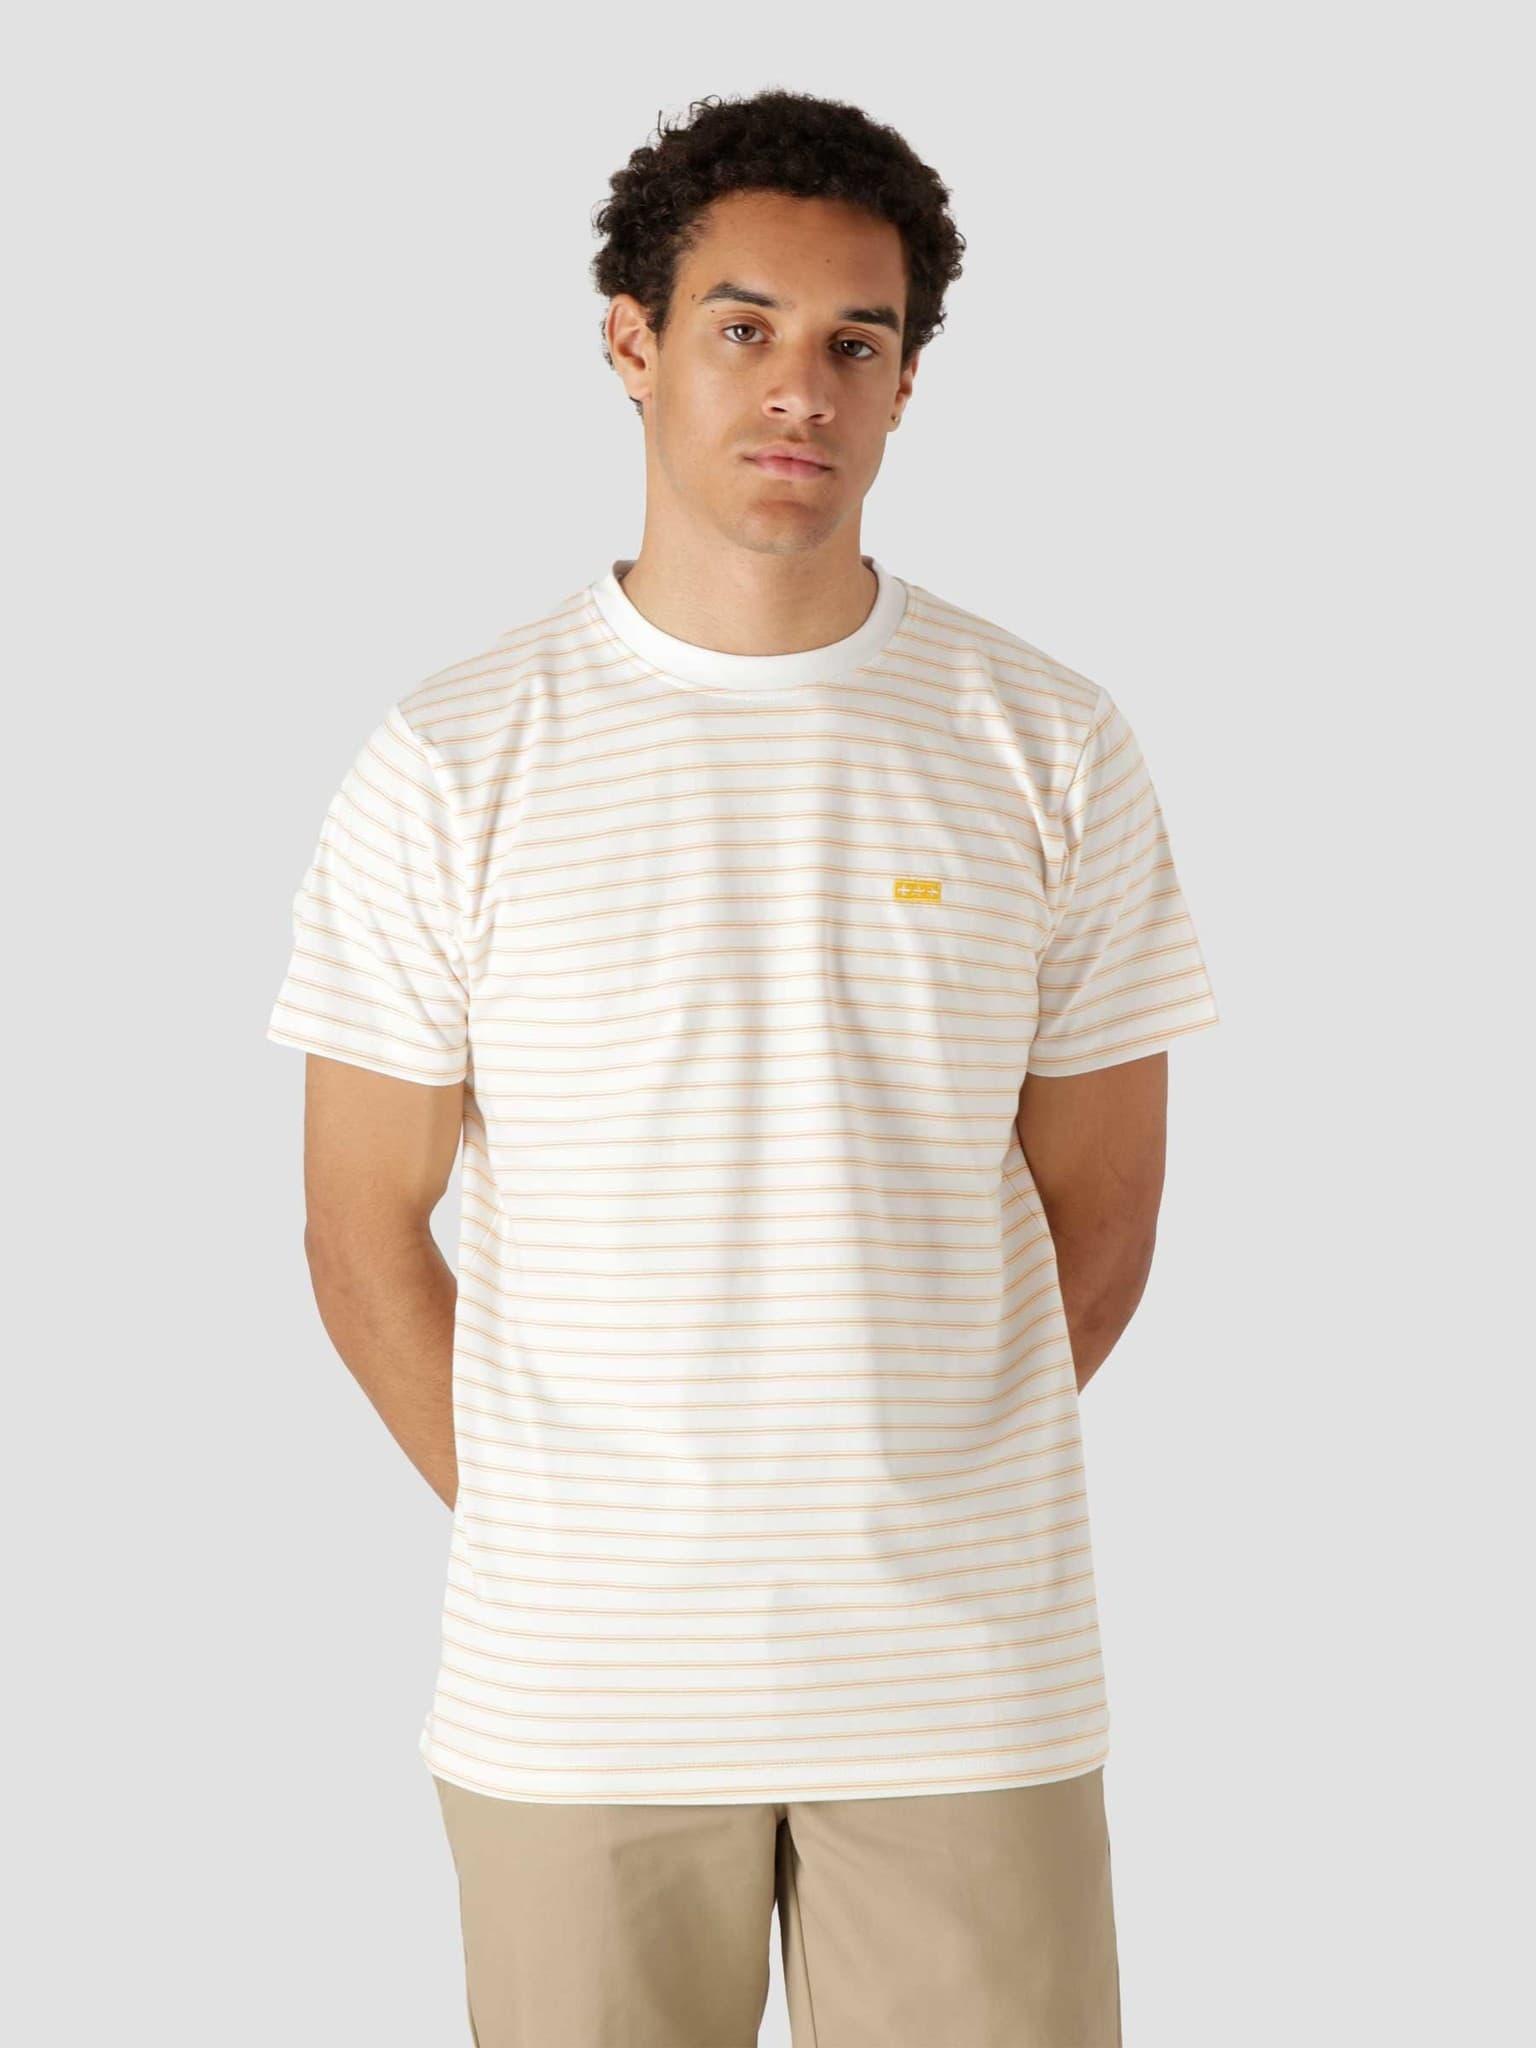 QB601 Stripe T-shirt White Orange Yellow